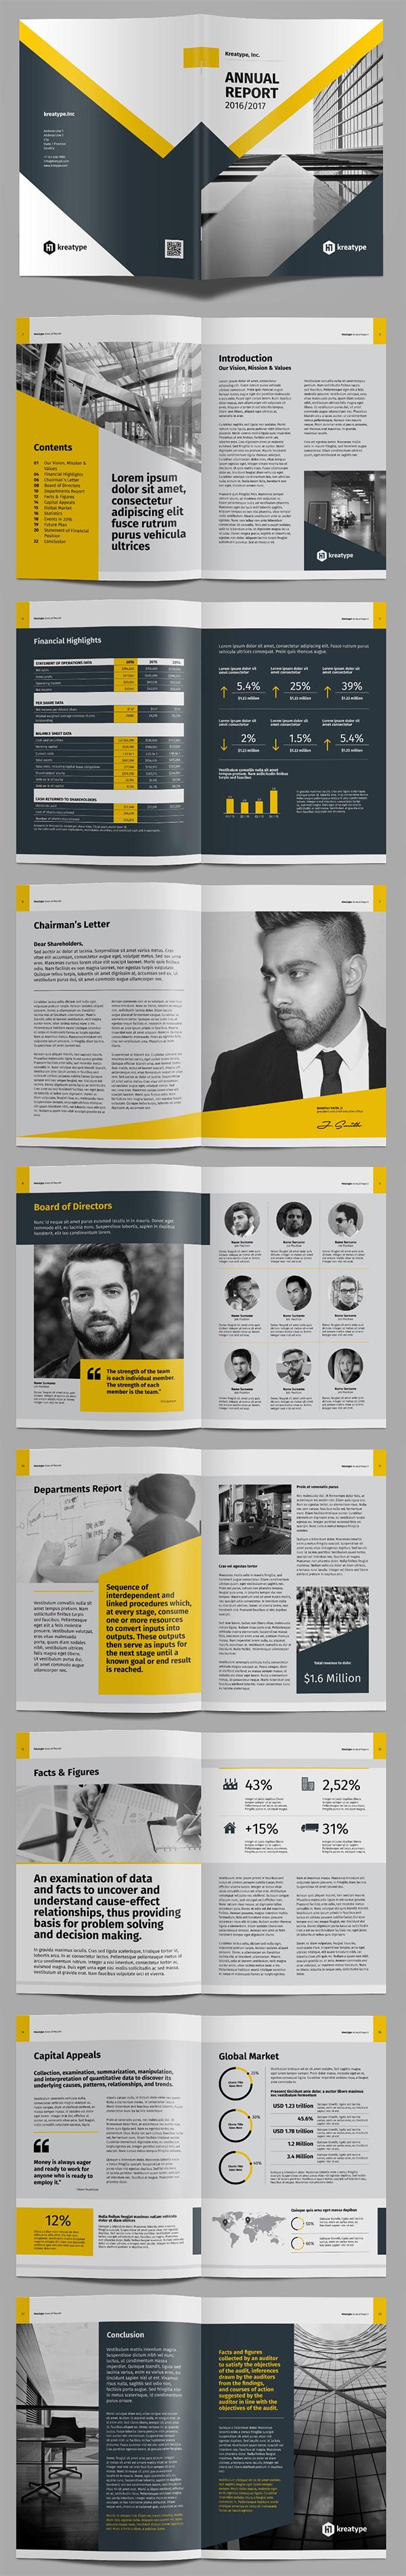 Kreatype Annual Report